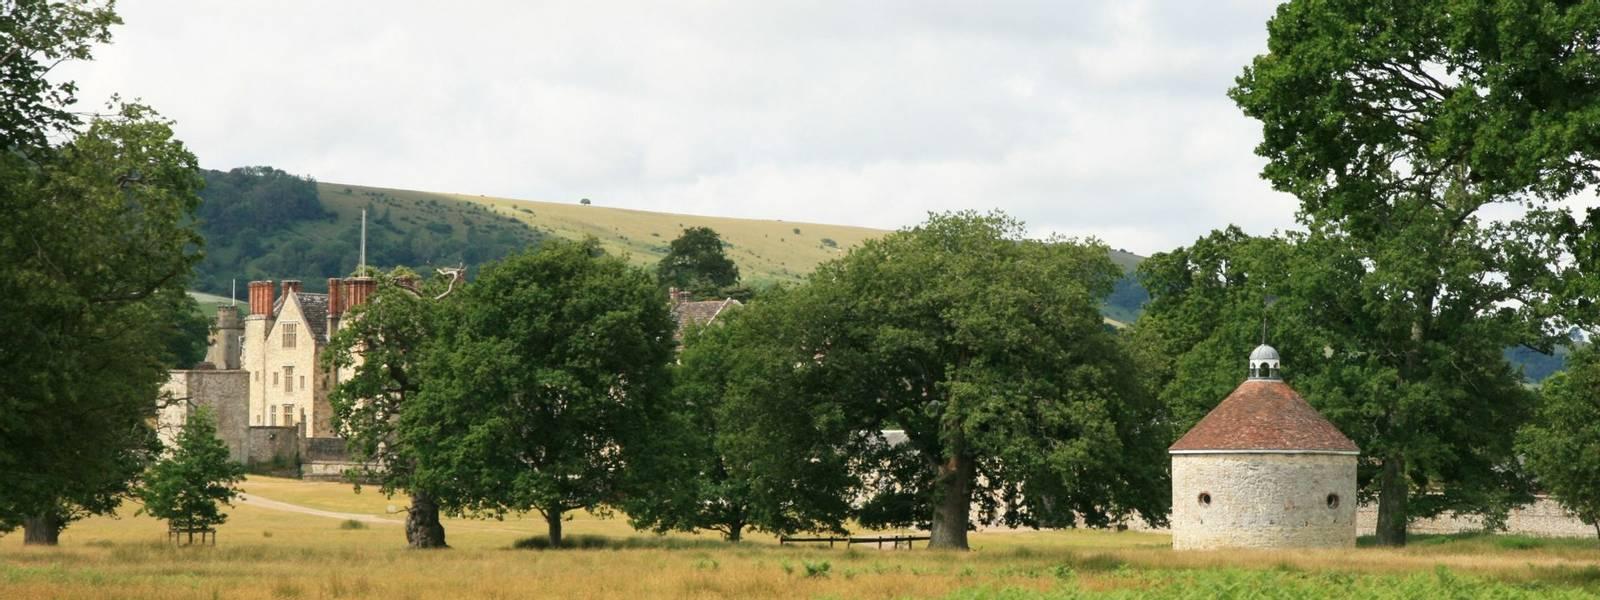 Parham House and Dovecote.JPG